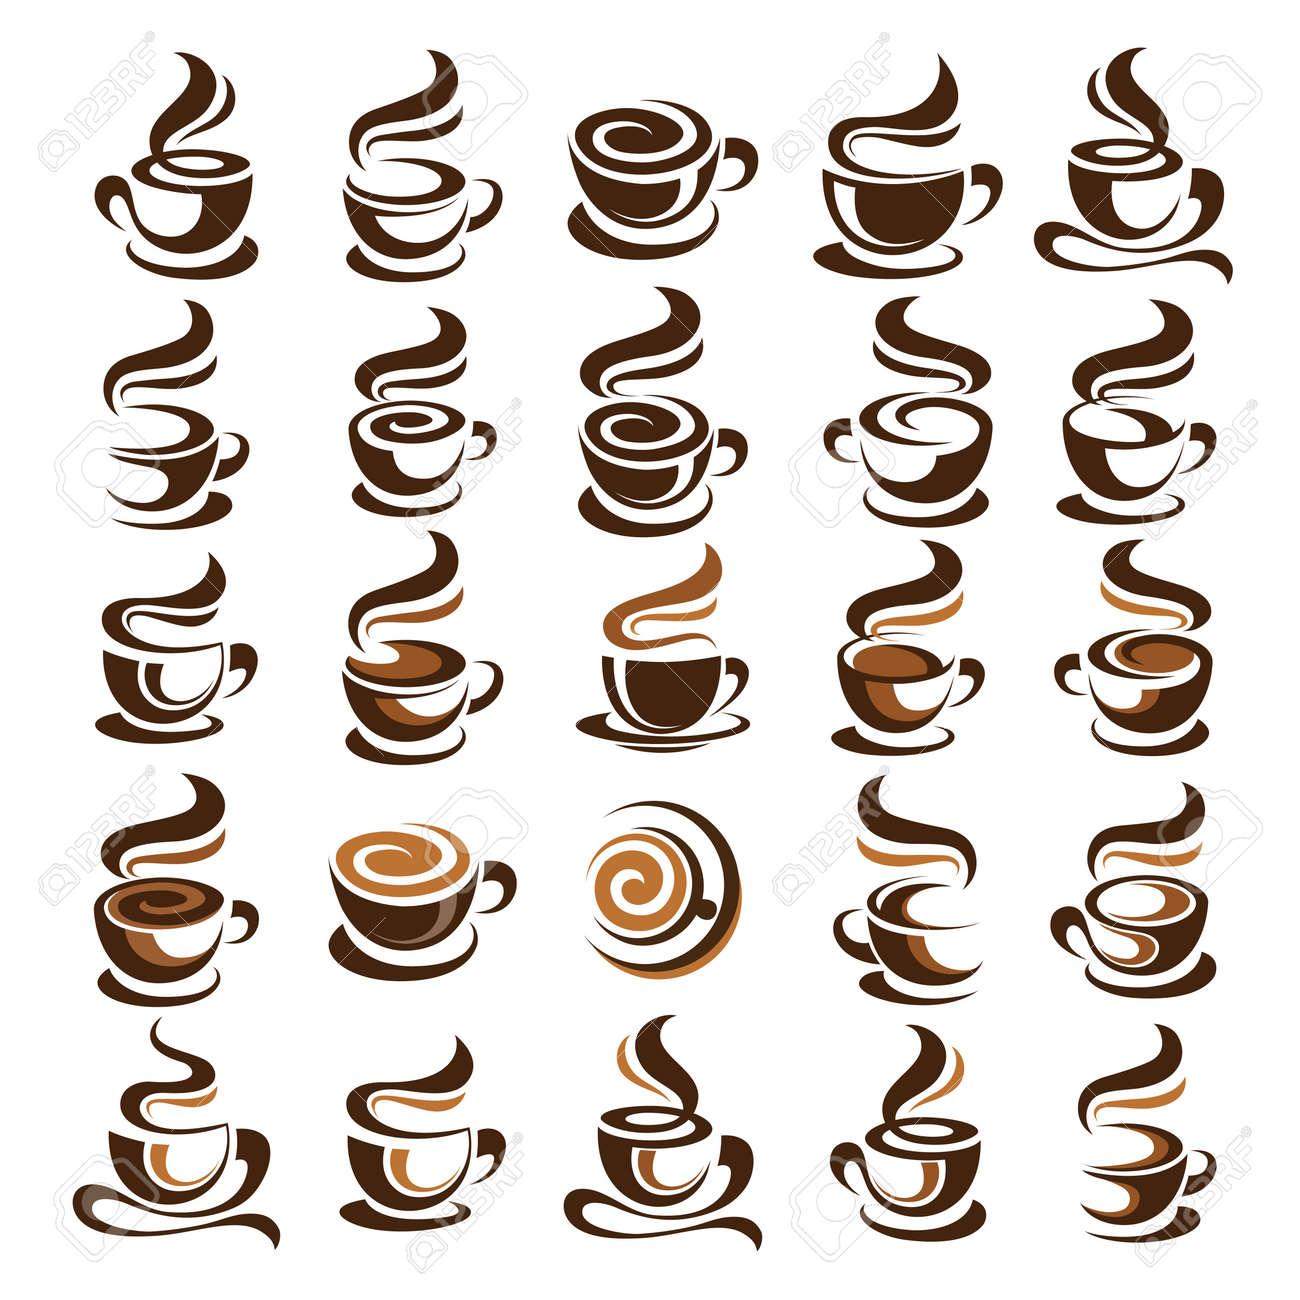 Coffee cup design icon set , vector illustration - 53440996